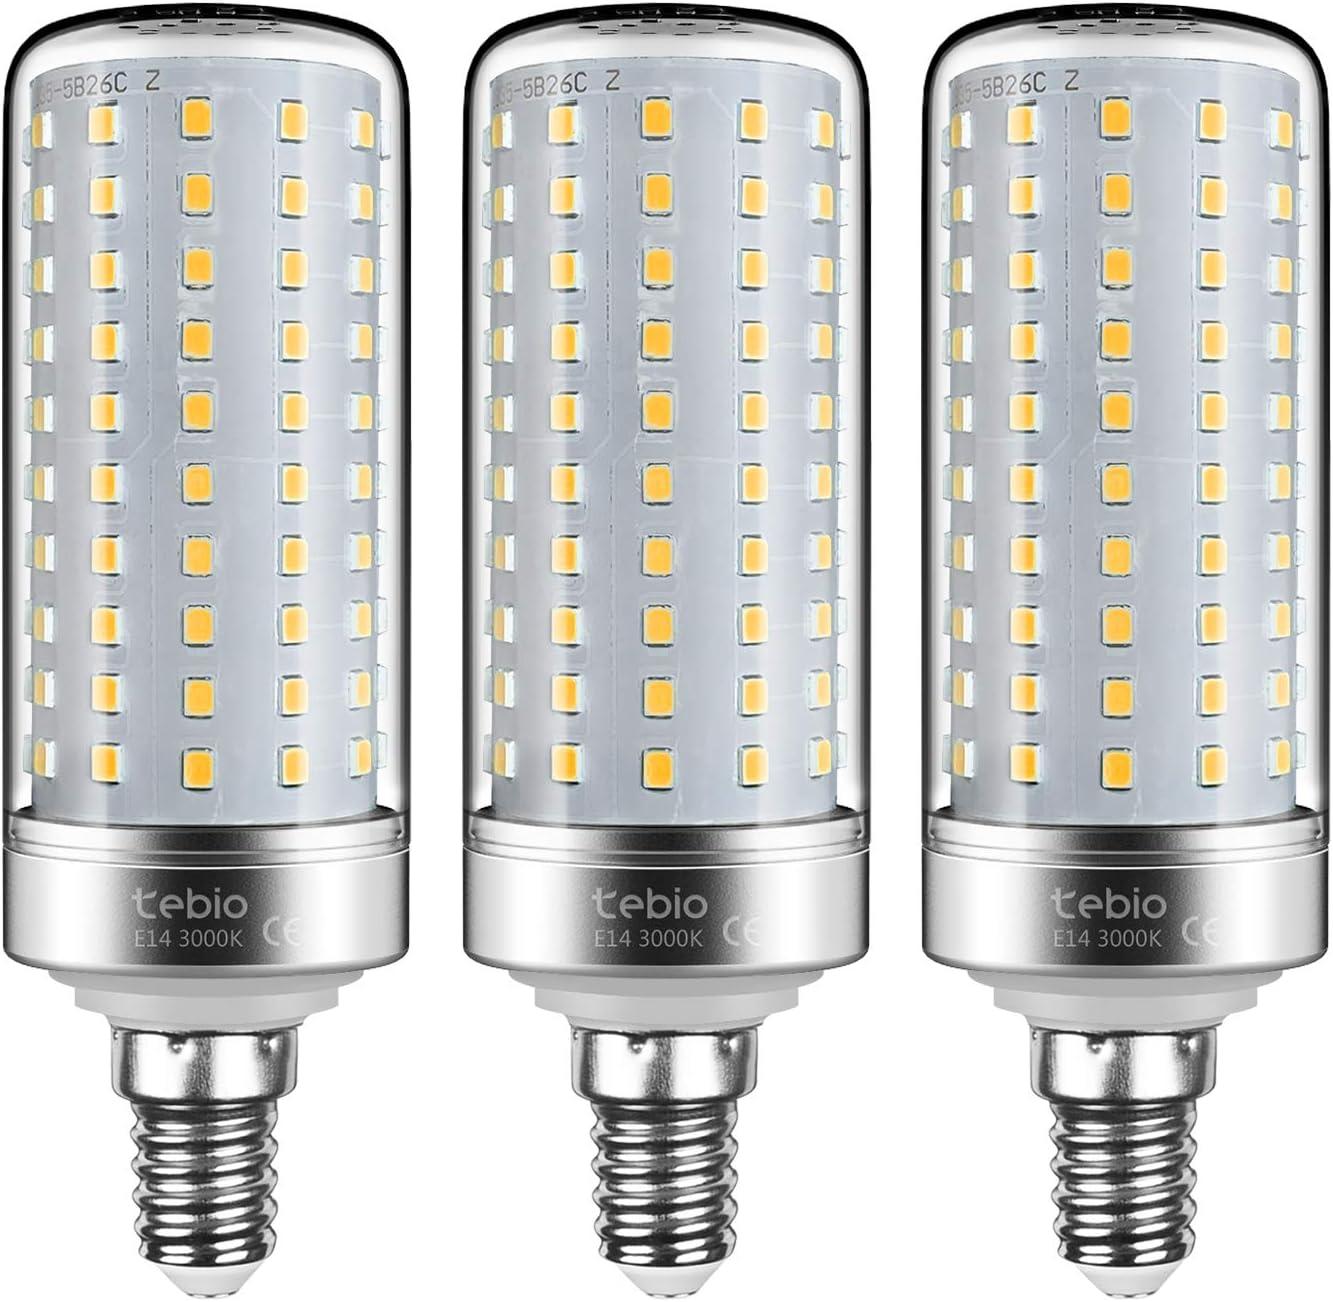 Tebio LED Plata Maíz Bombillas 25W E14 3000K Blanco Cálido LED Candelabros bombillas, 200W Bombilla Incandescente Equivalente, 2500LM, LED vela Bombillas No regulables, 3 Packs